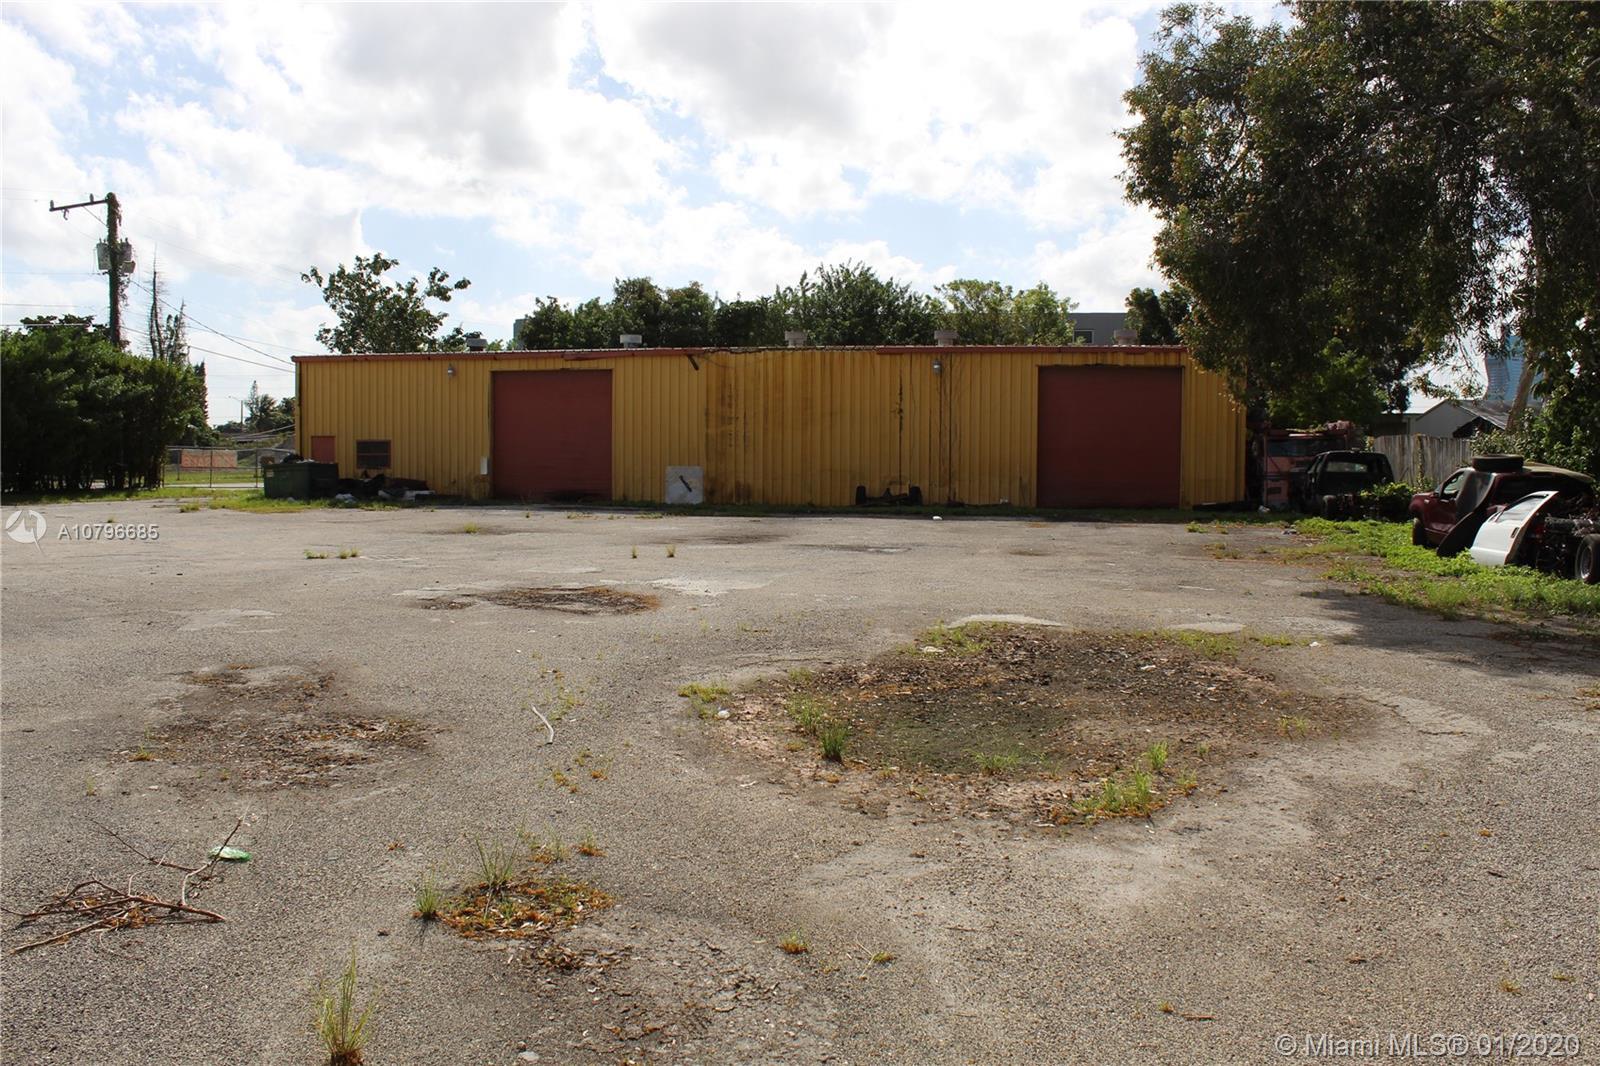 4601 SW 44th Ave, Dania Beach, FL 33314